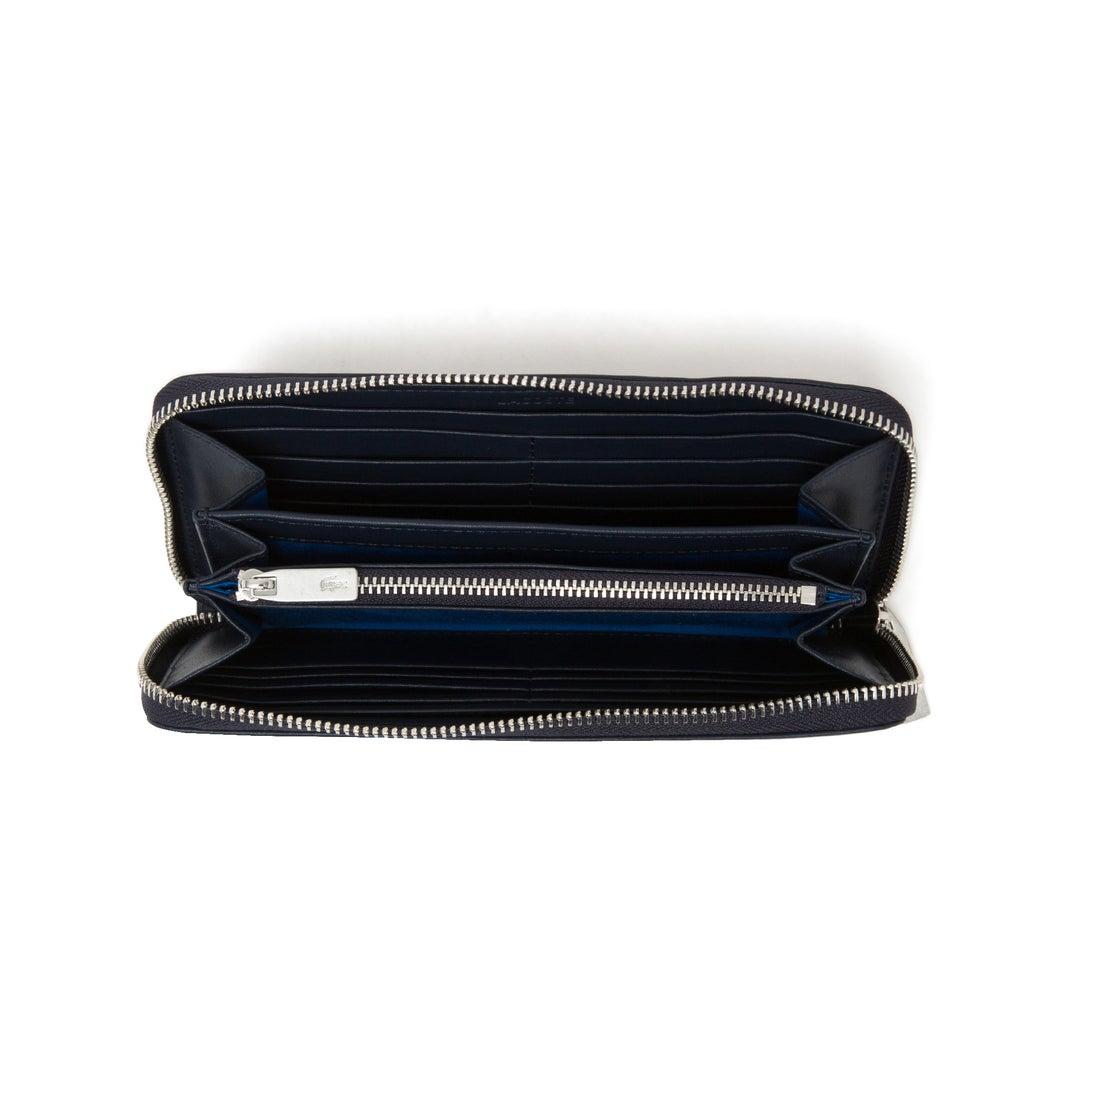 aa10b6671a35 ラコステ LACOSTE FG 長財布 (ブラック) -ラグジュアリーブランド通販 ...